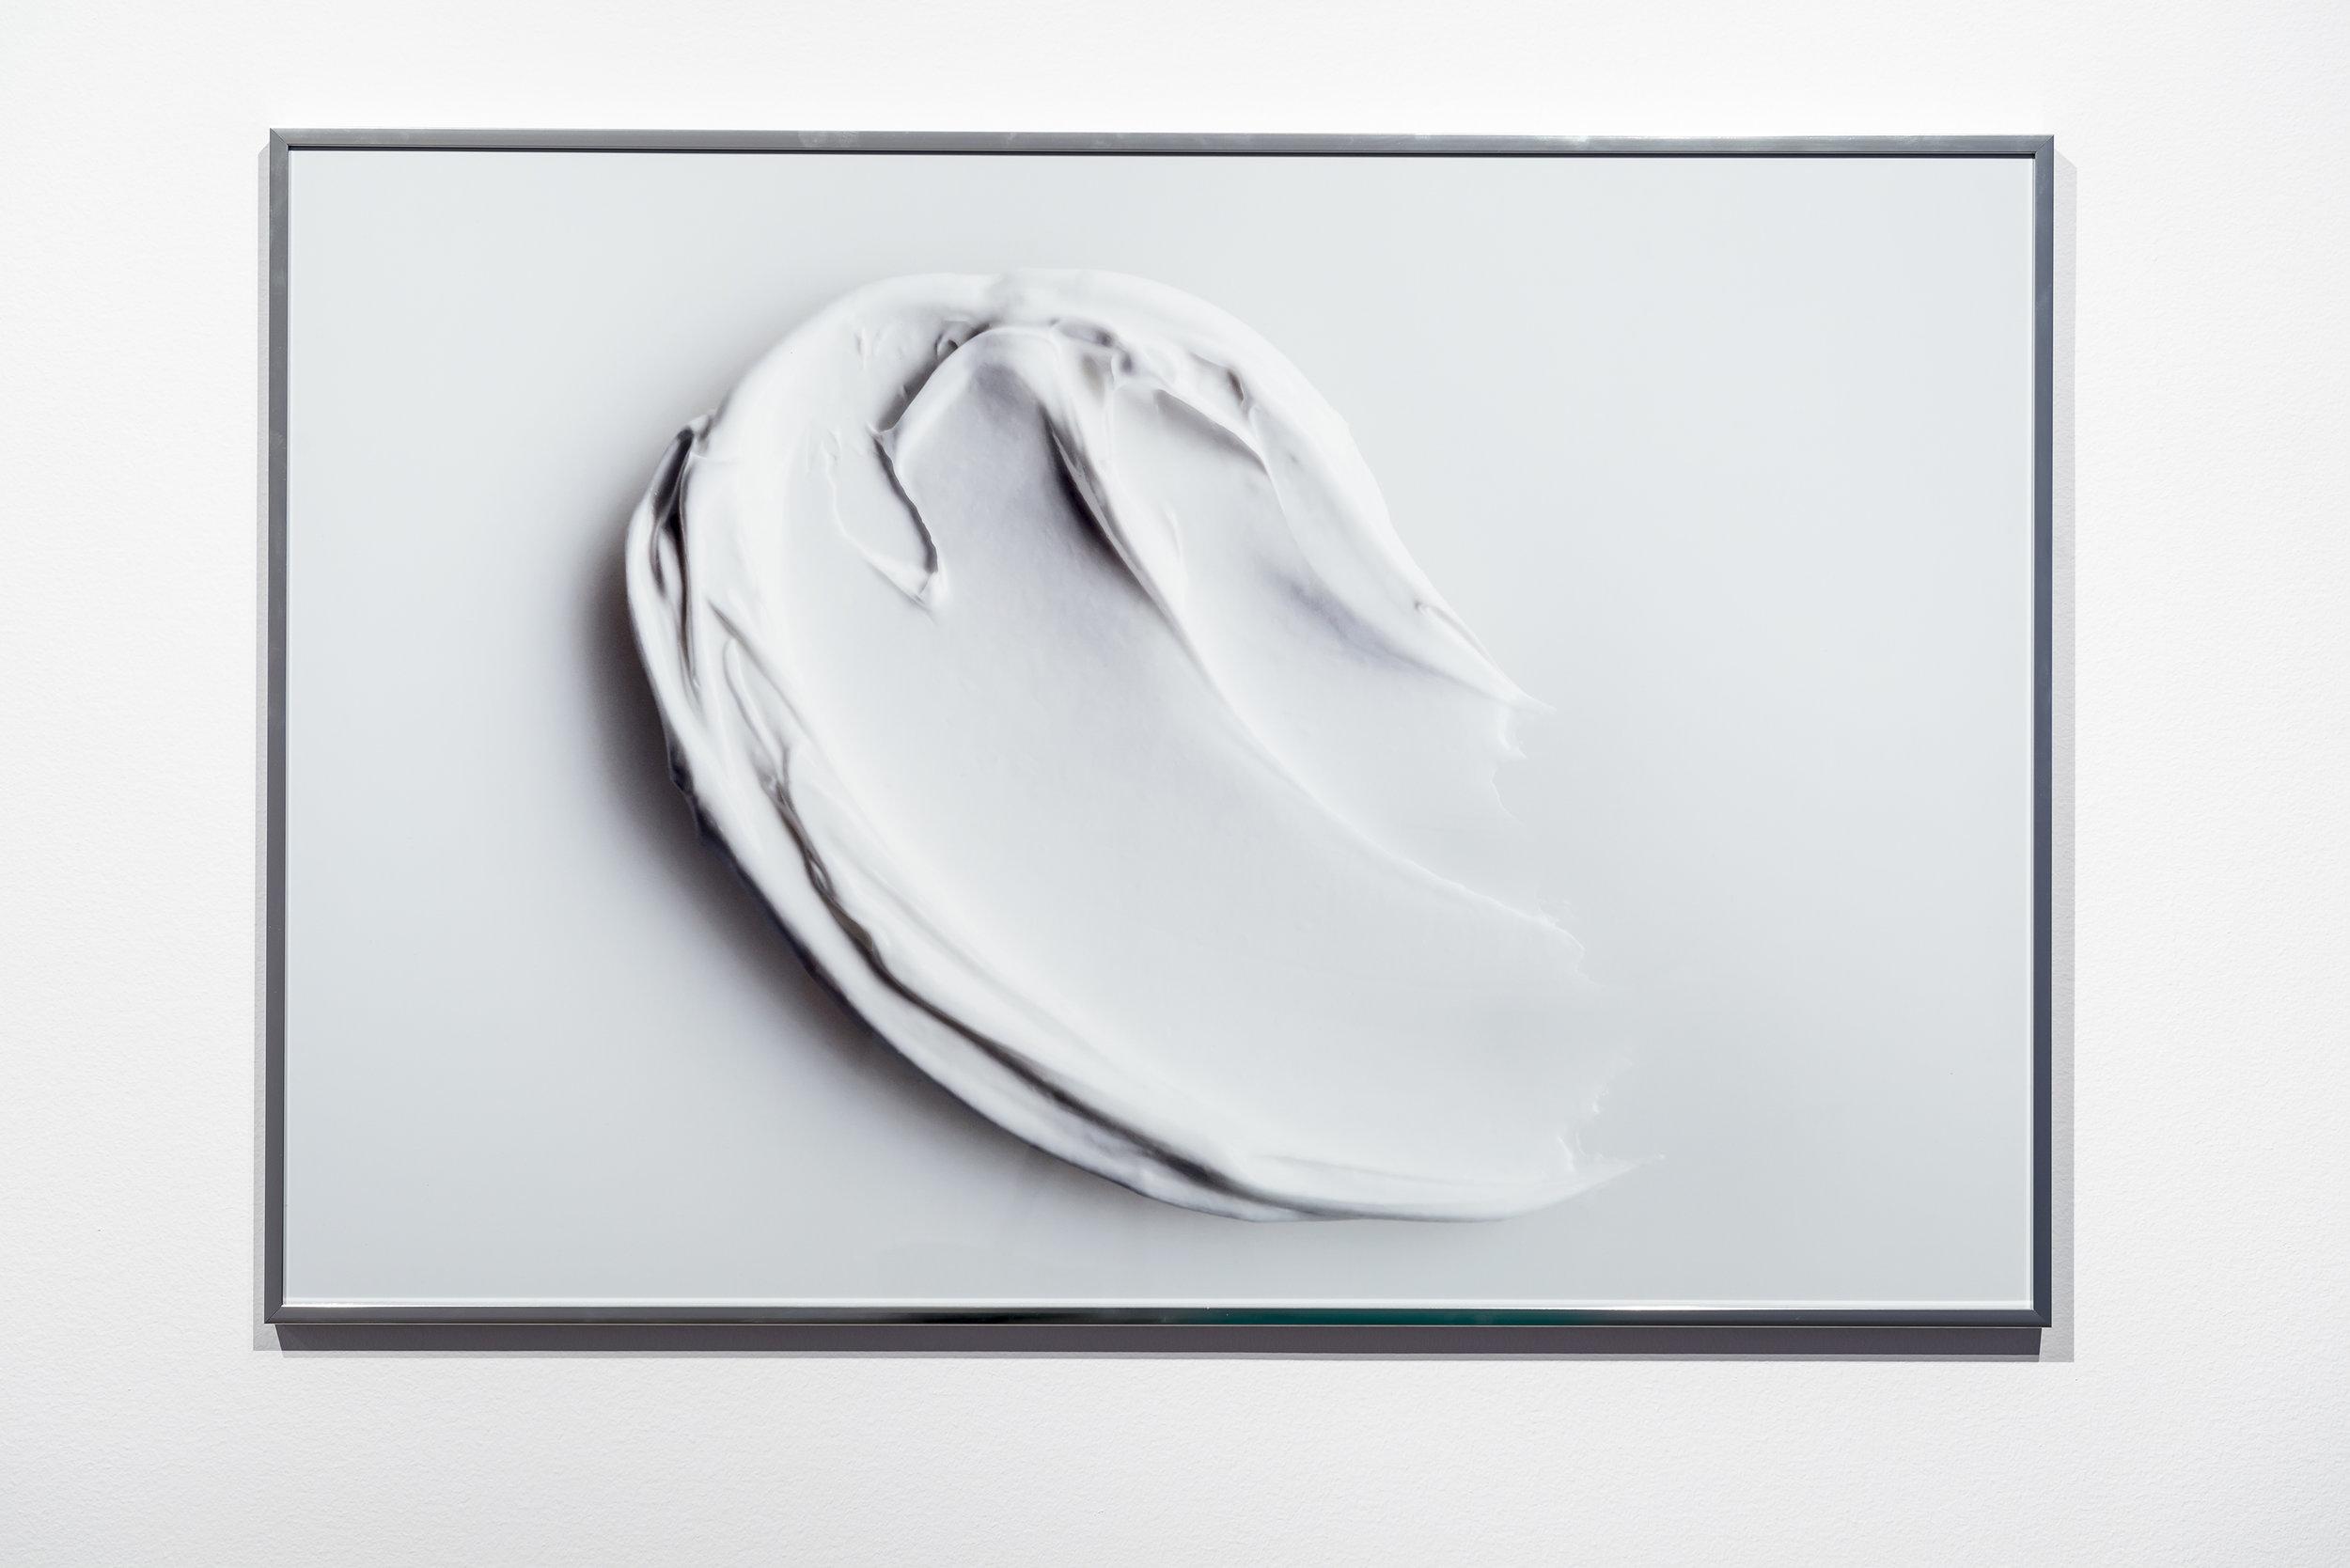 Zoe Williams, You consume me II, 2013 chromogenic print on paper, aluminum frame 68 x 102 x 2,5 cm - 26 3/4 x 40 1/8 x 1 inches (framed)